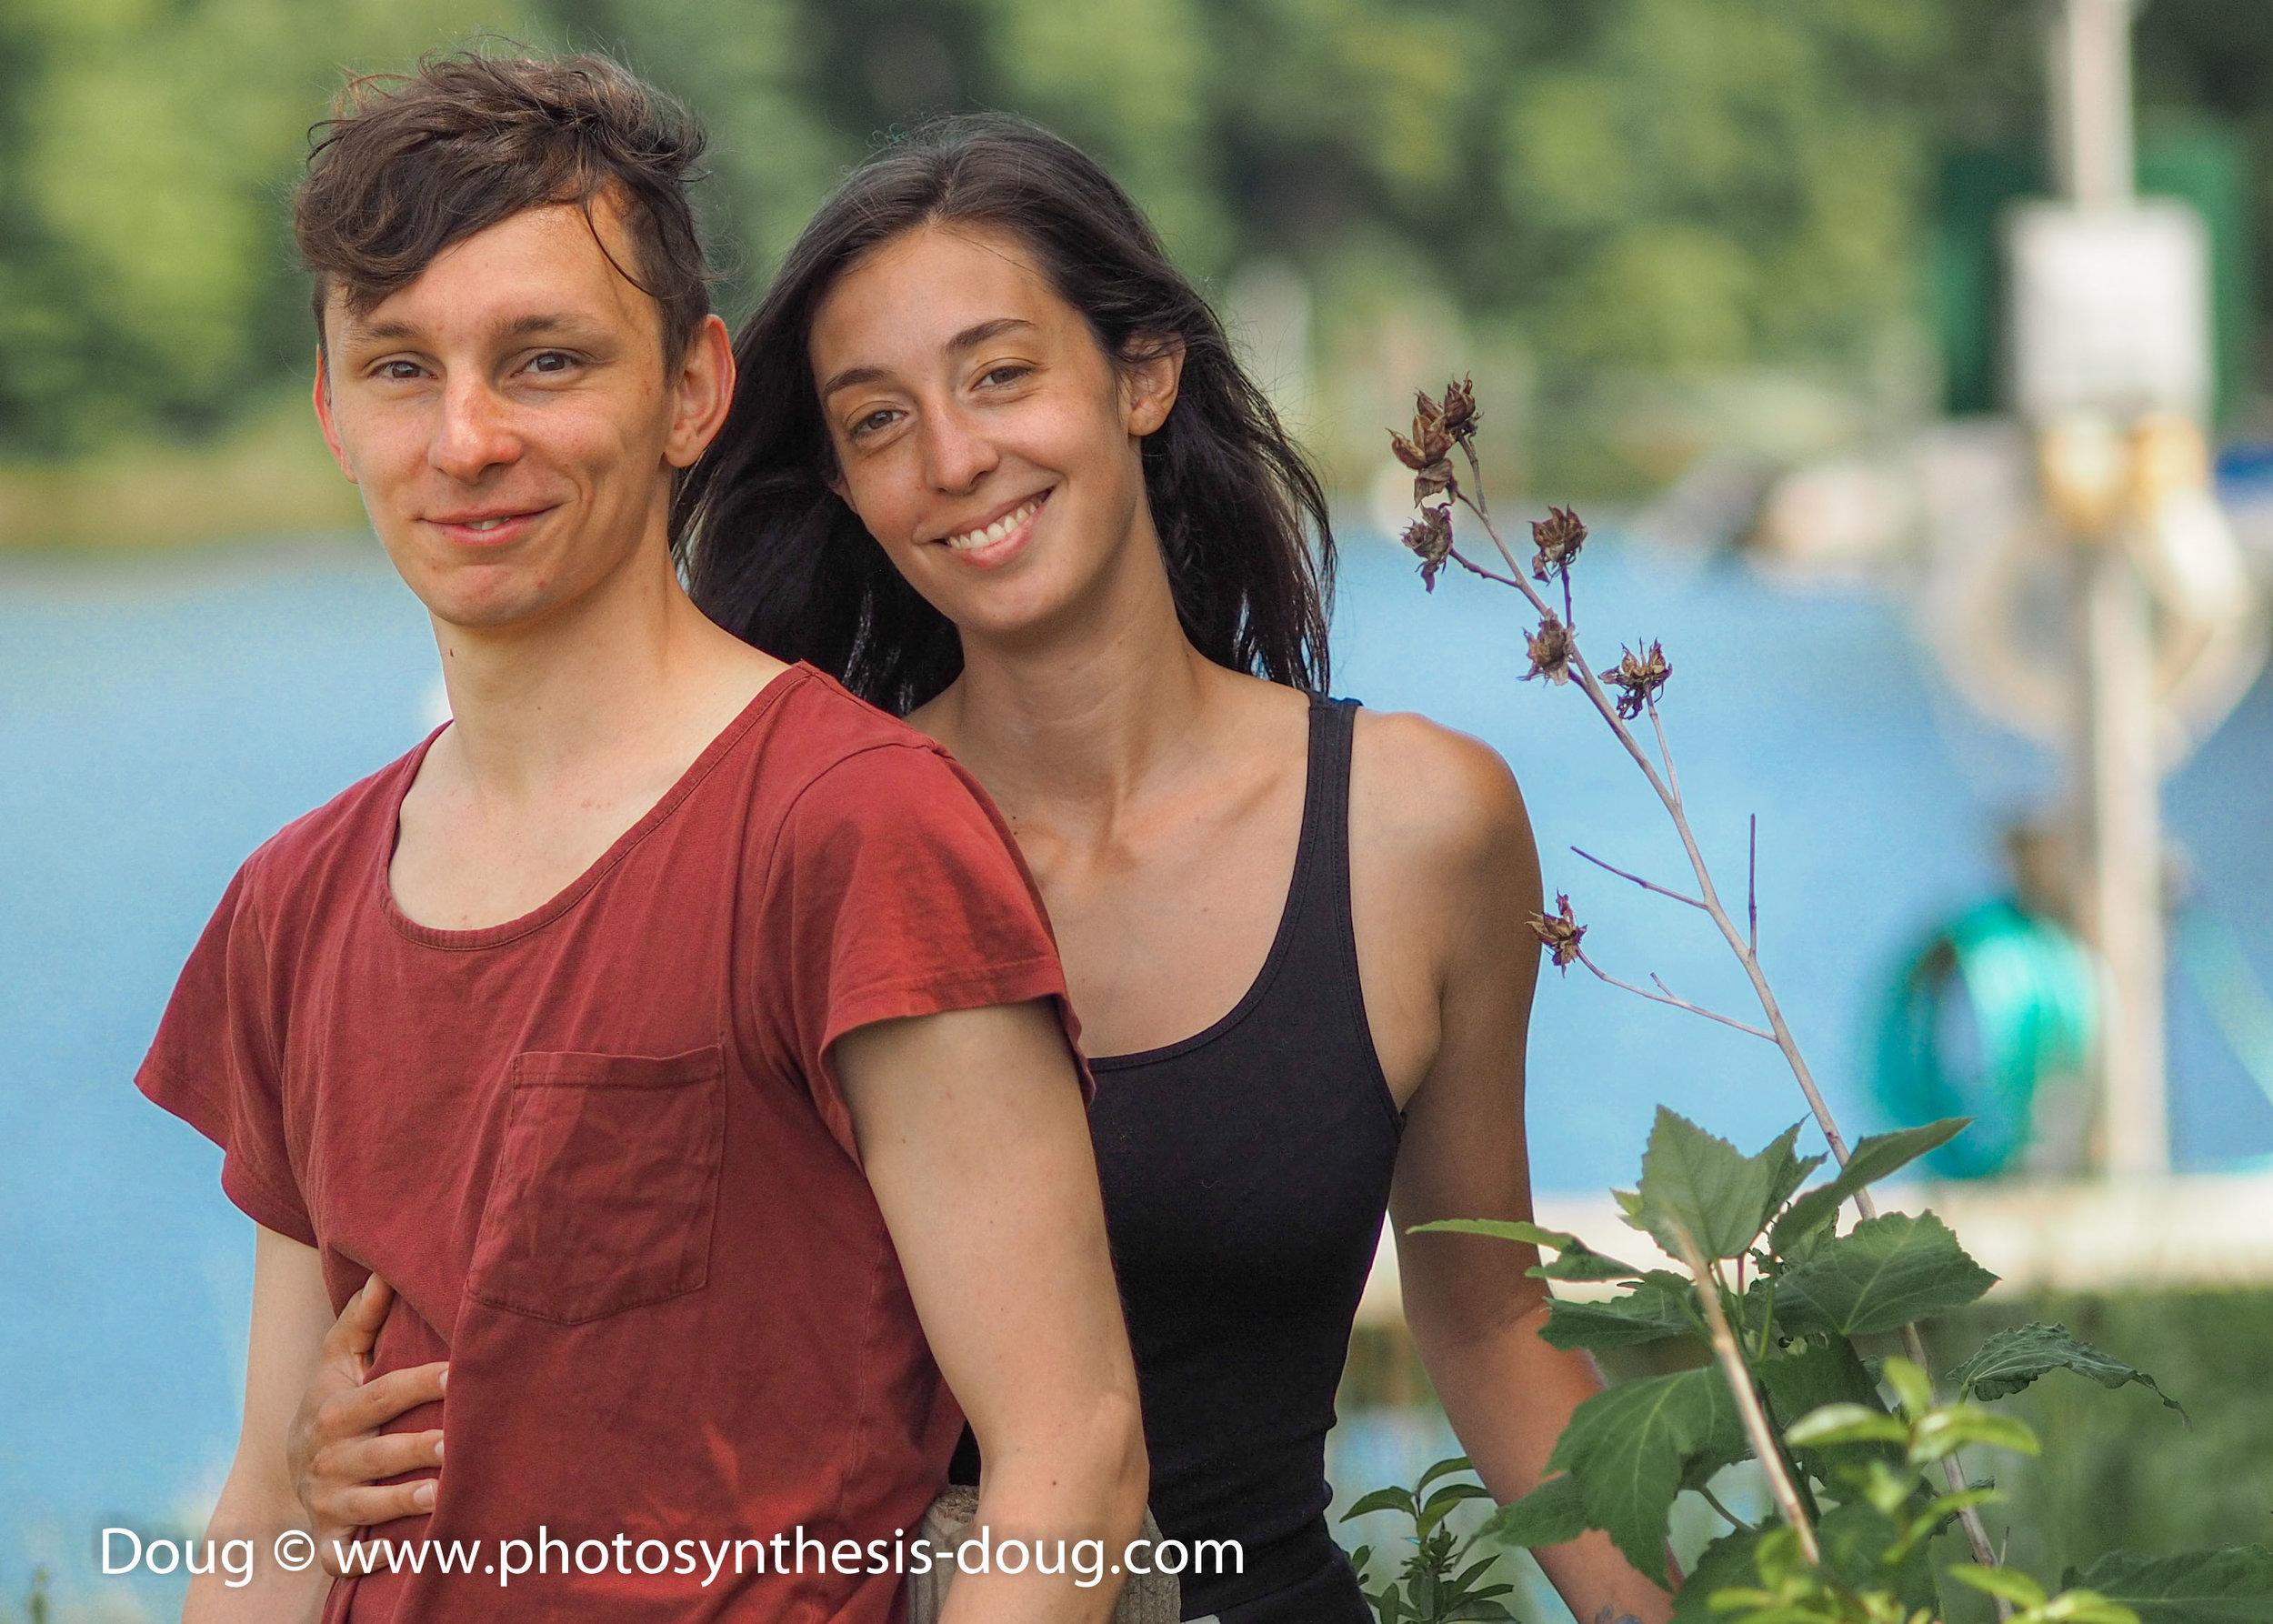 Christoph and Anne-6200031.jpg